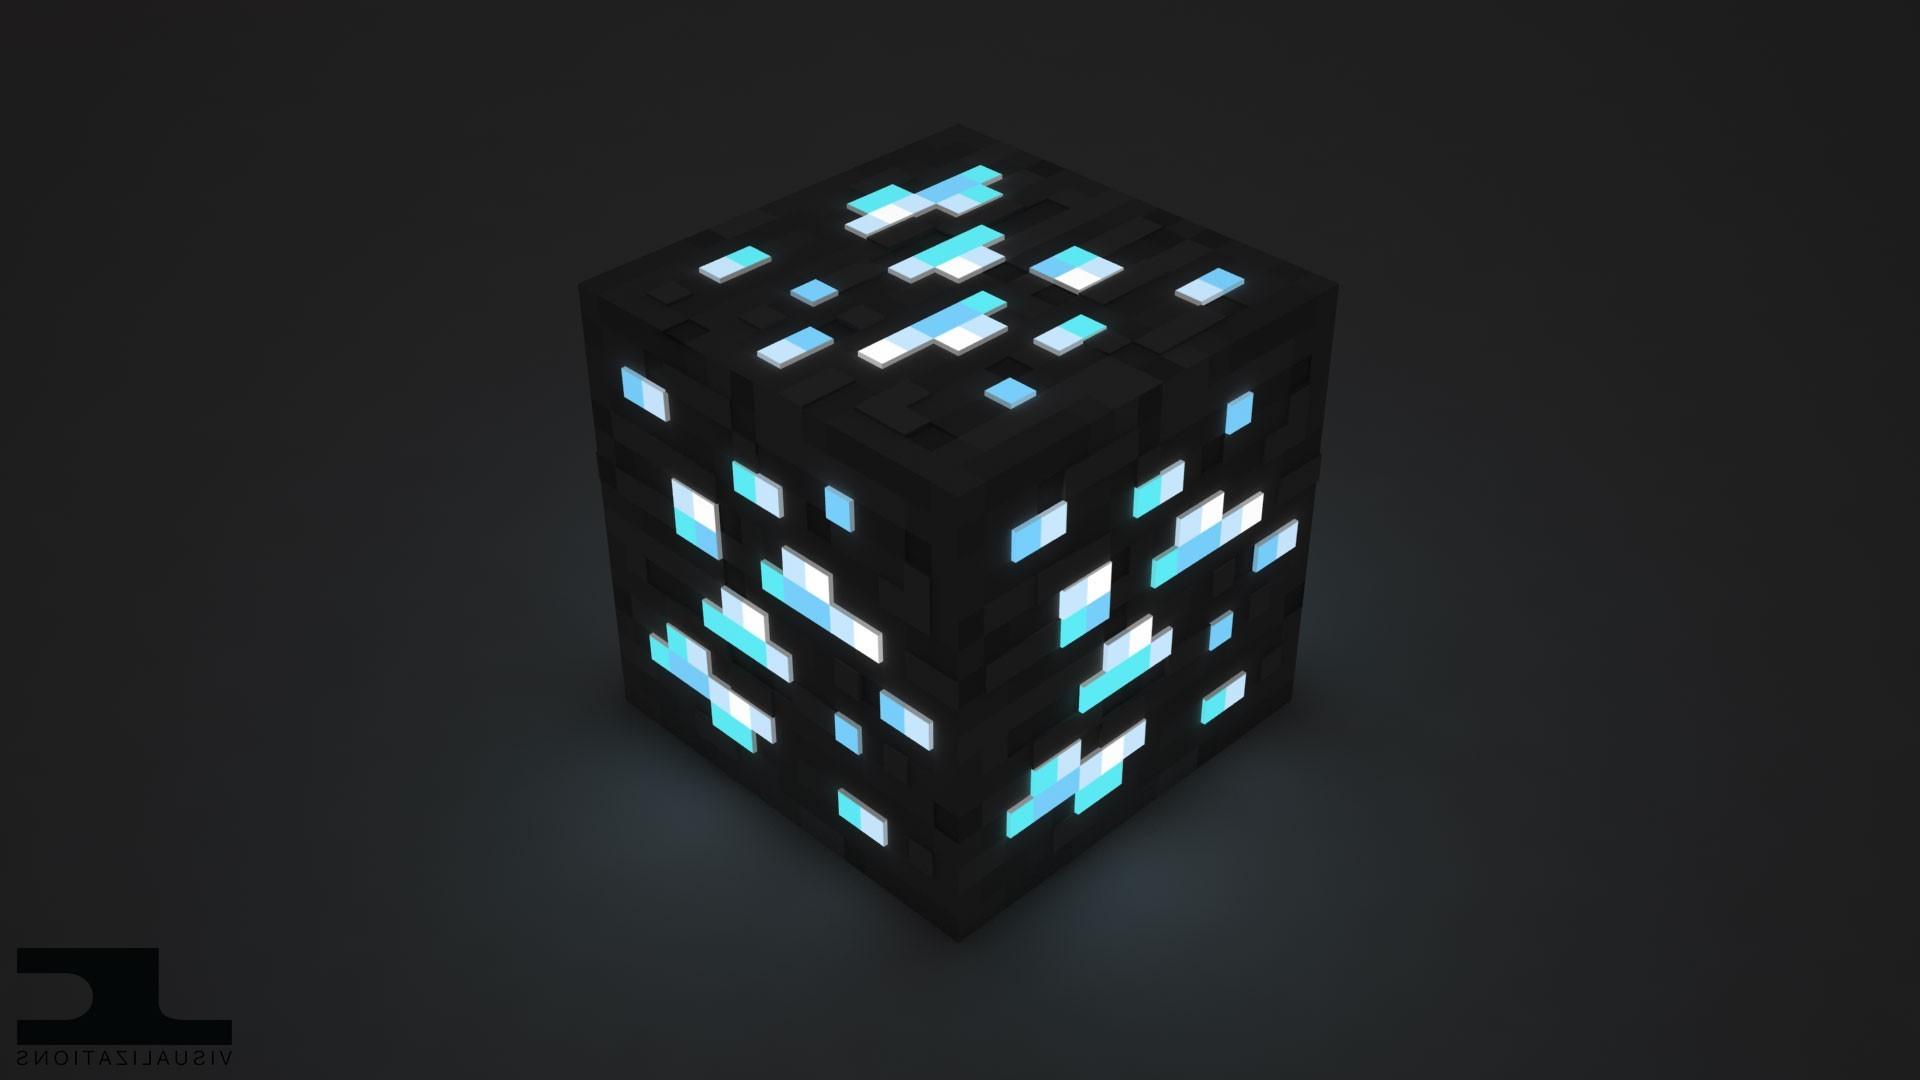 Wallpaper Minecraft 3d Minecraft Cube Video Games Wallpapers Hd Desktop And